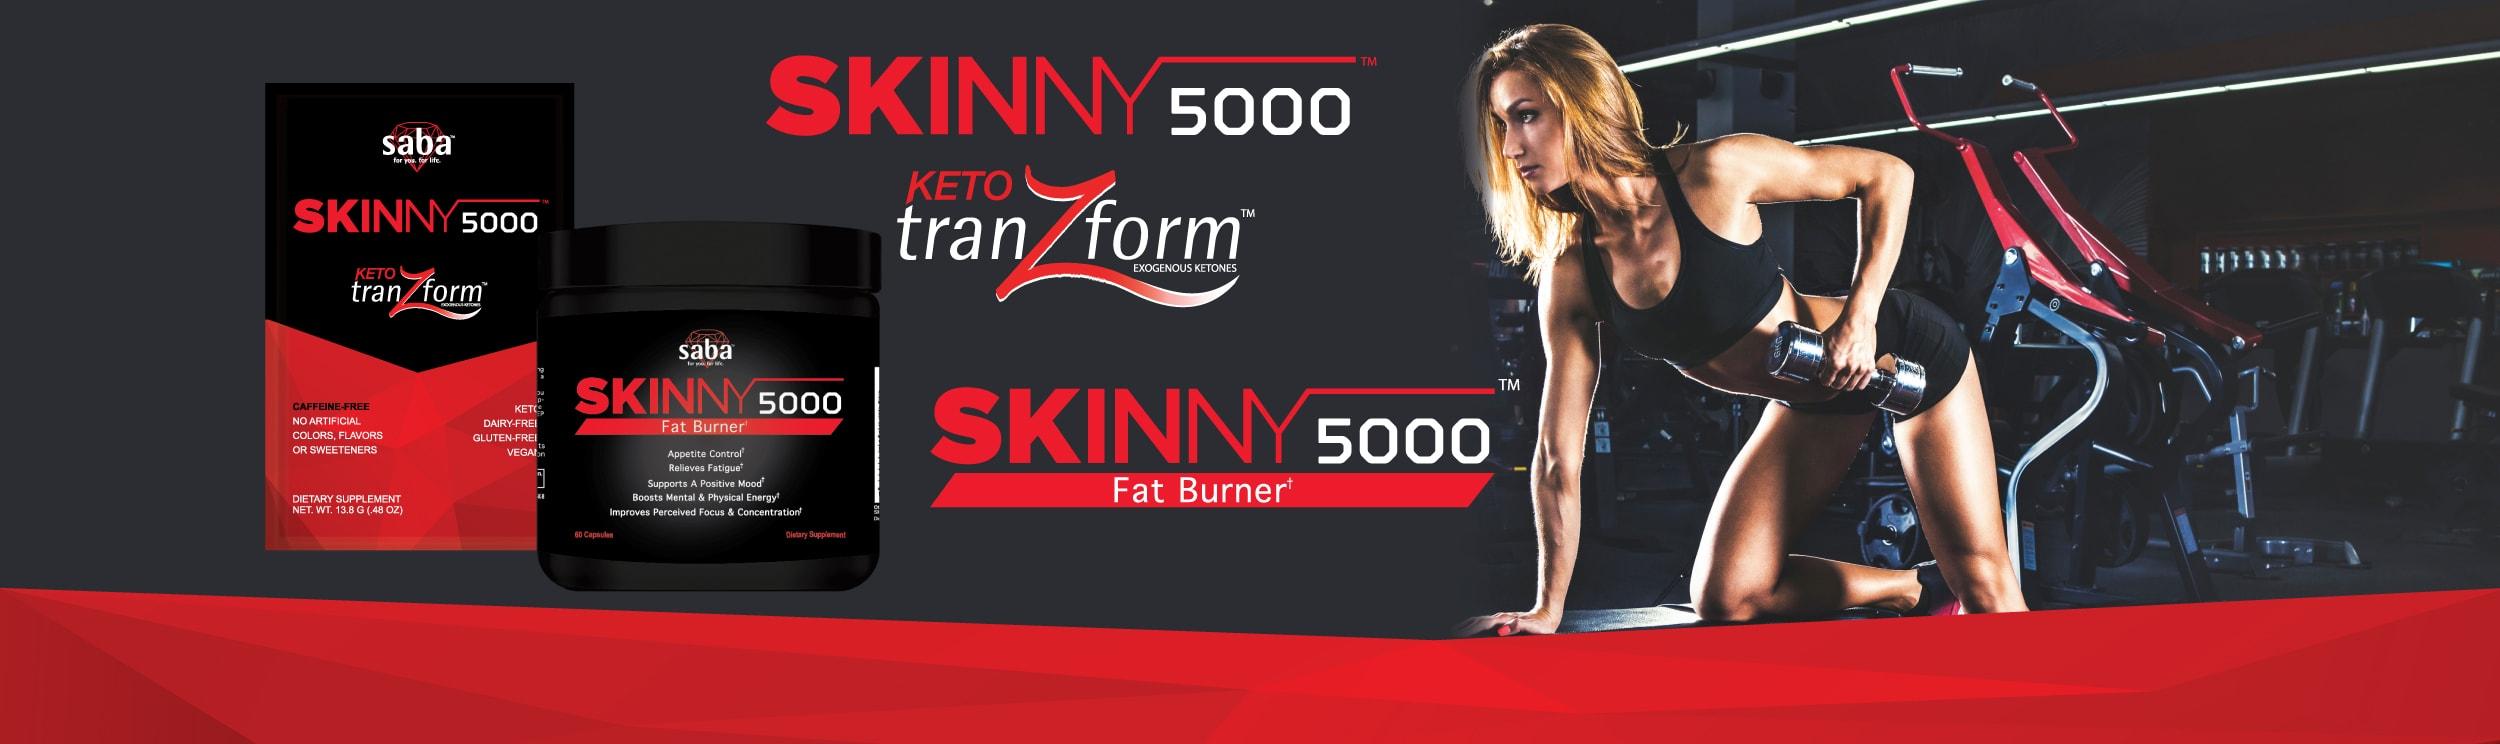 Skinny5000